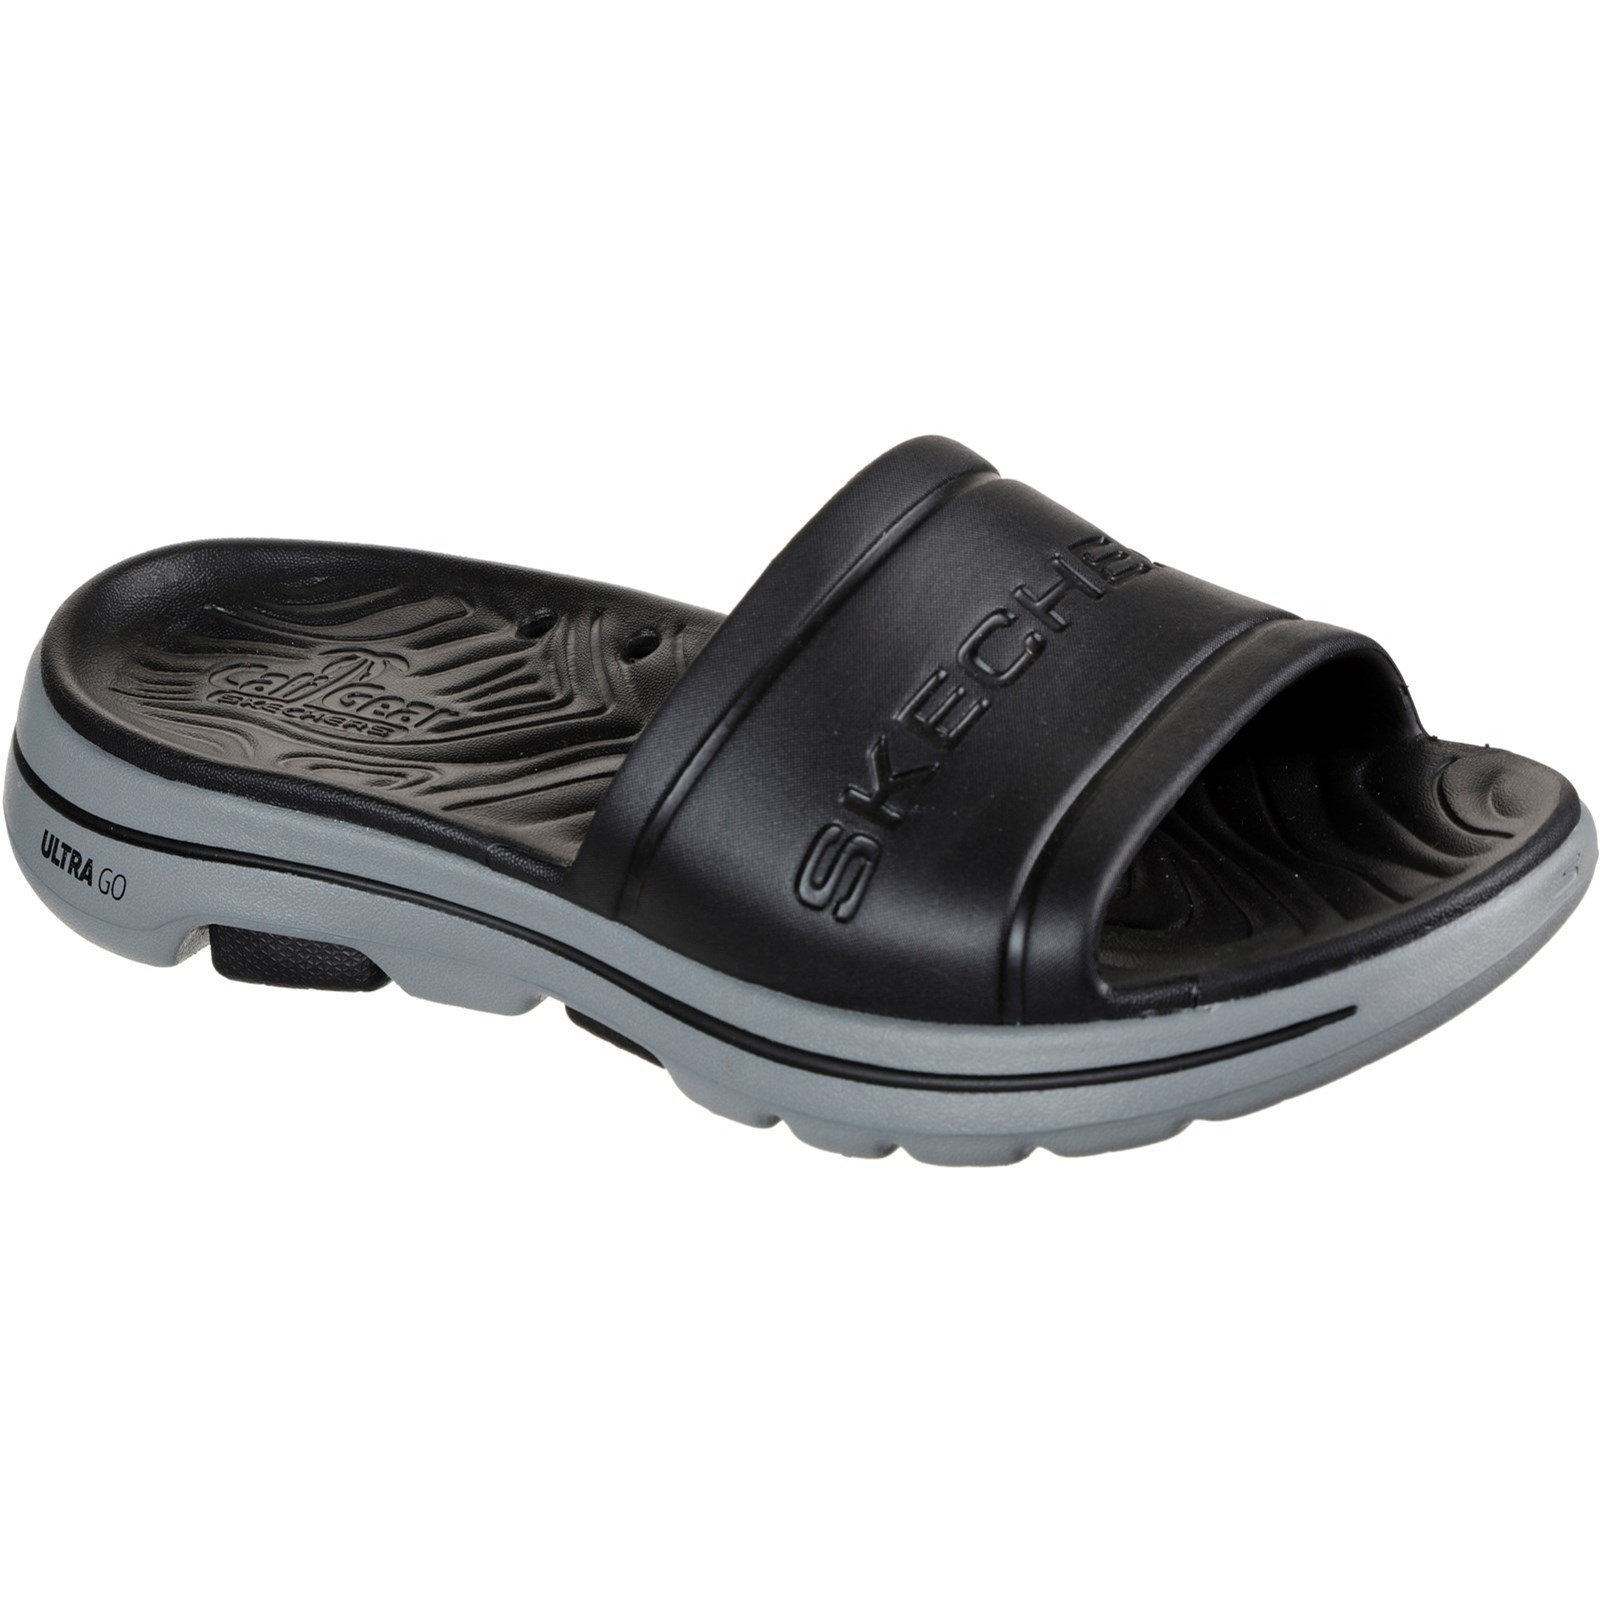 Skechers Men's Go Walk 5 Surfs Out Summer Sandal Various Colours 32207 - Black/Grey 11